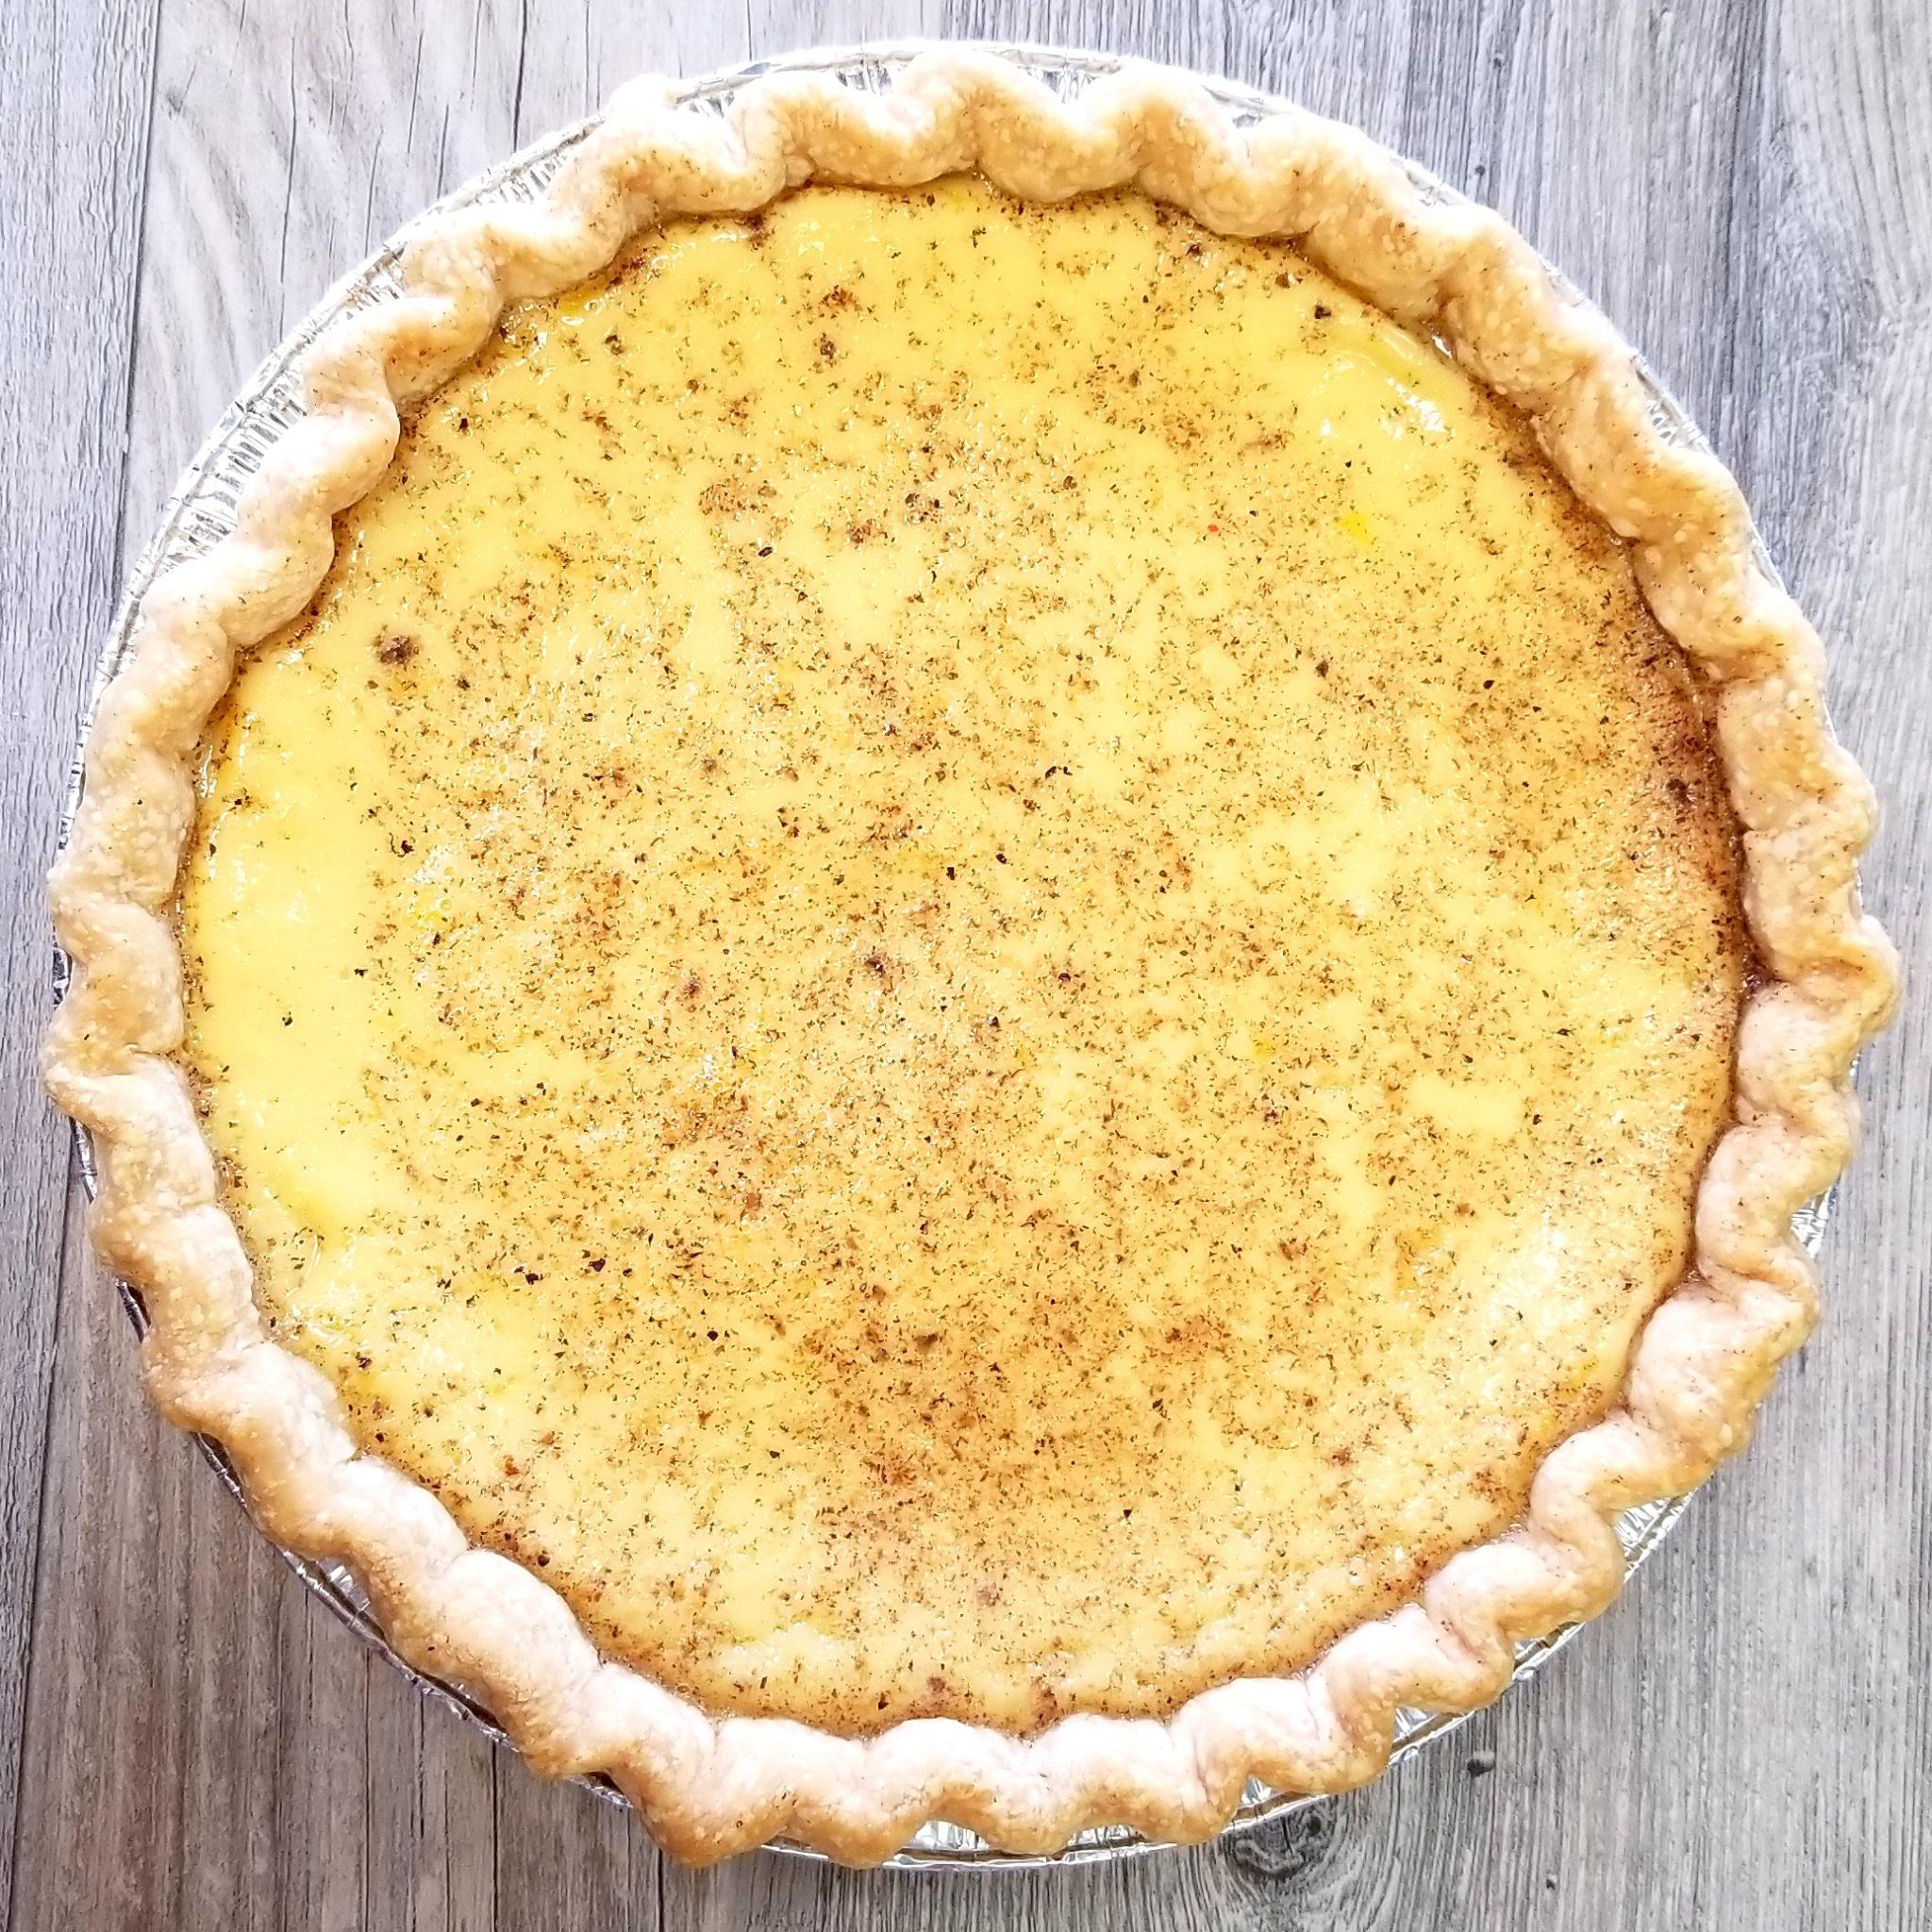 fayetteville-rymolenes-pies-egg-custard-pie-by-kat-robinson.jpg